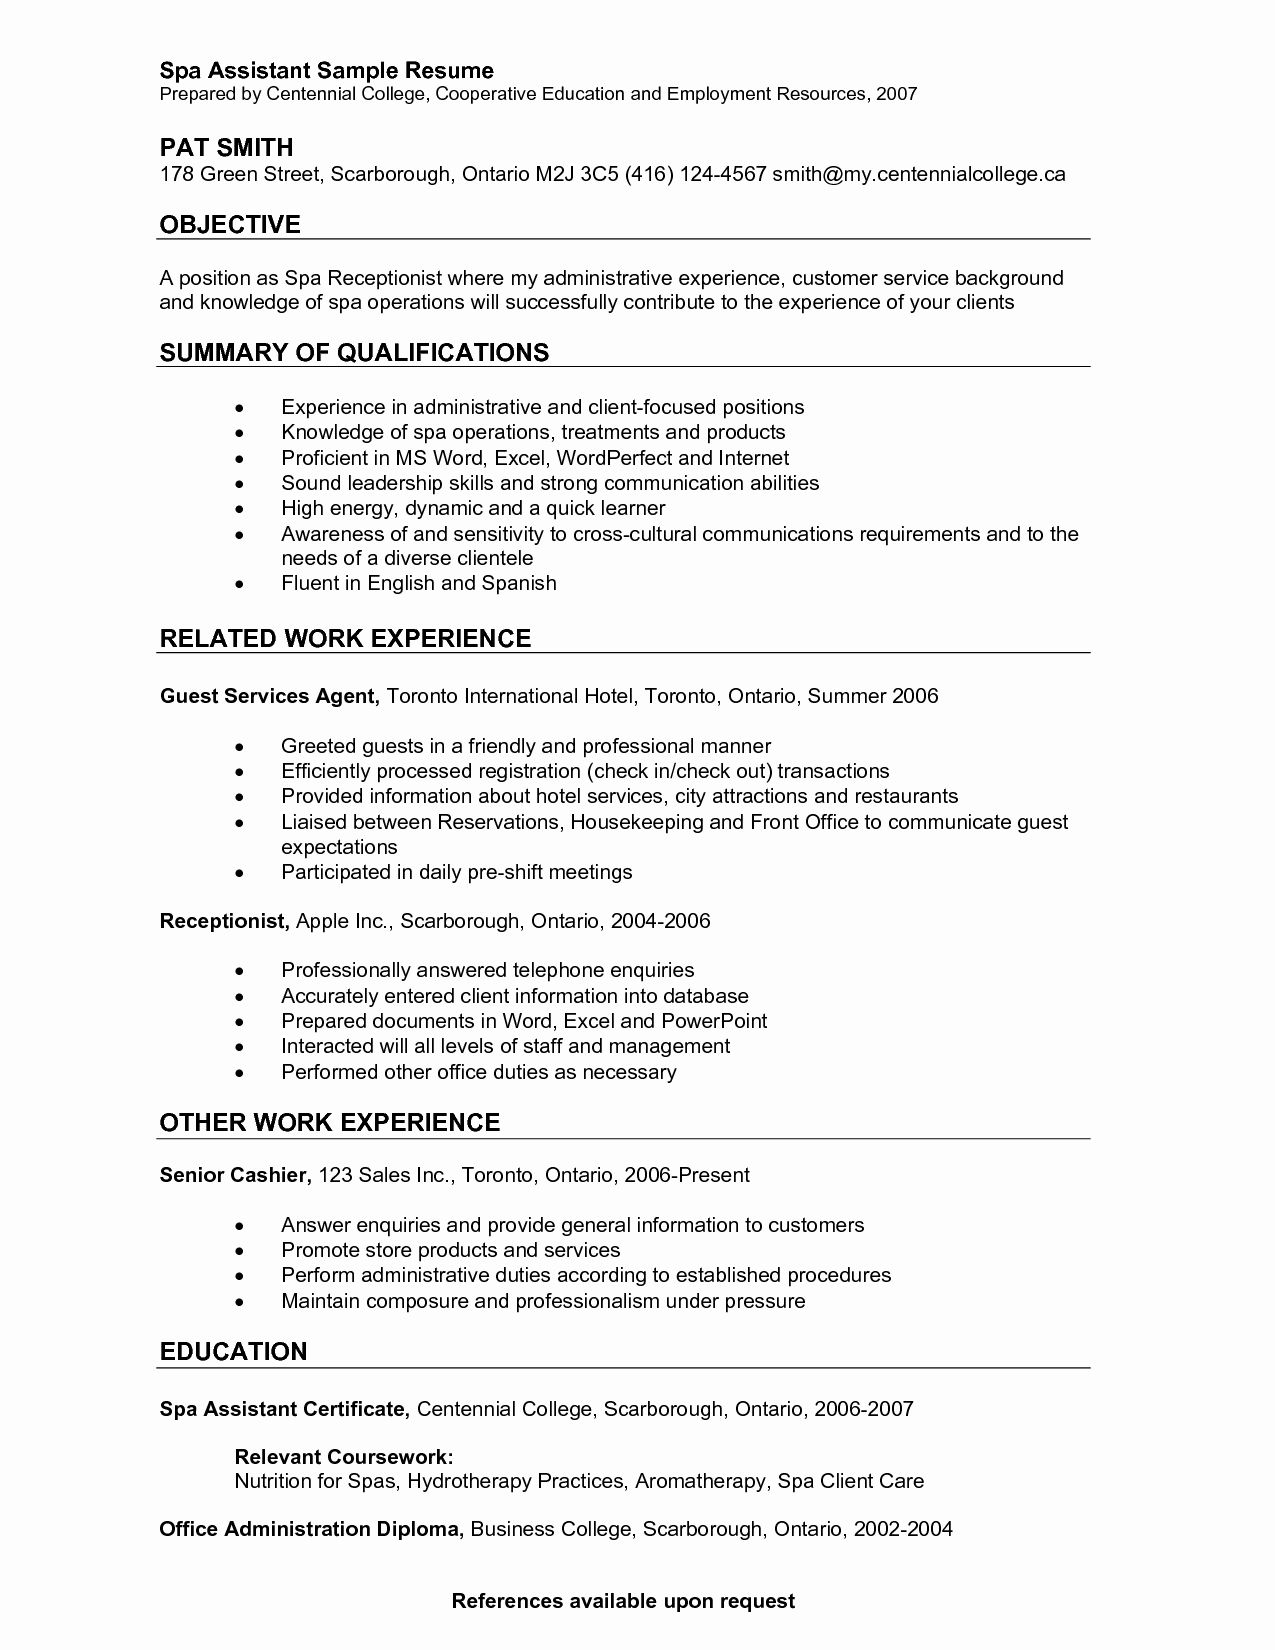 Medical Receptionist Resume Examples Elegant Medical Receptionist Resume Objective Samples Resume Medical Assistant Resume Resume Examples Job Resume Samples